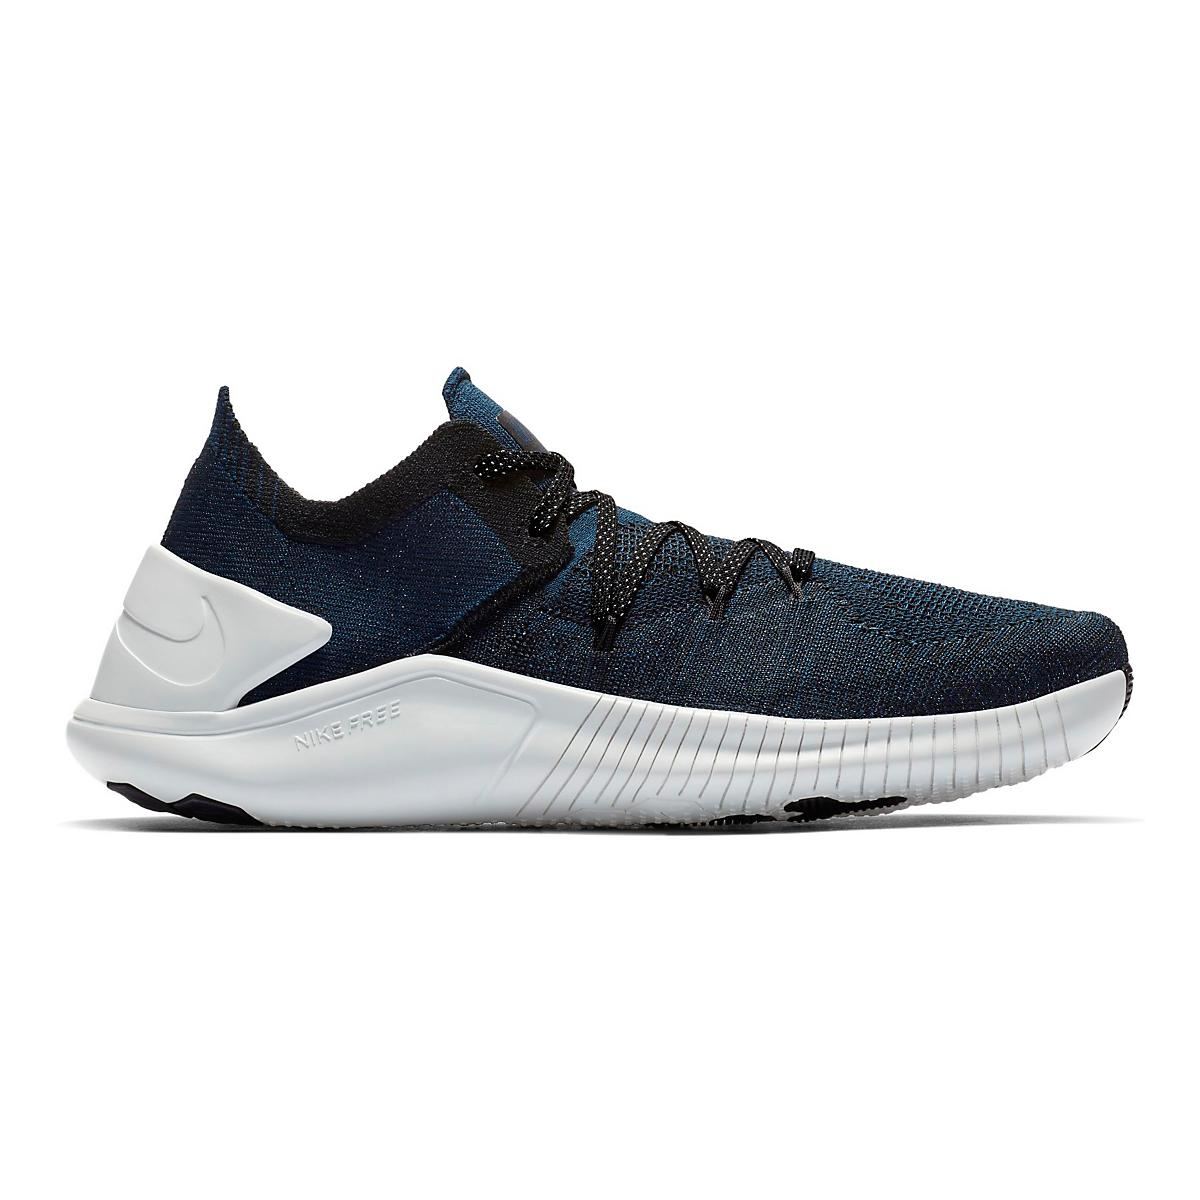 74a46fb6d0703 Womens Nike Free TR Flyknit 3 Metallic Cross Training Shoe at Road Runner  Sports